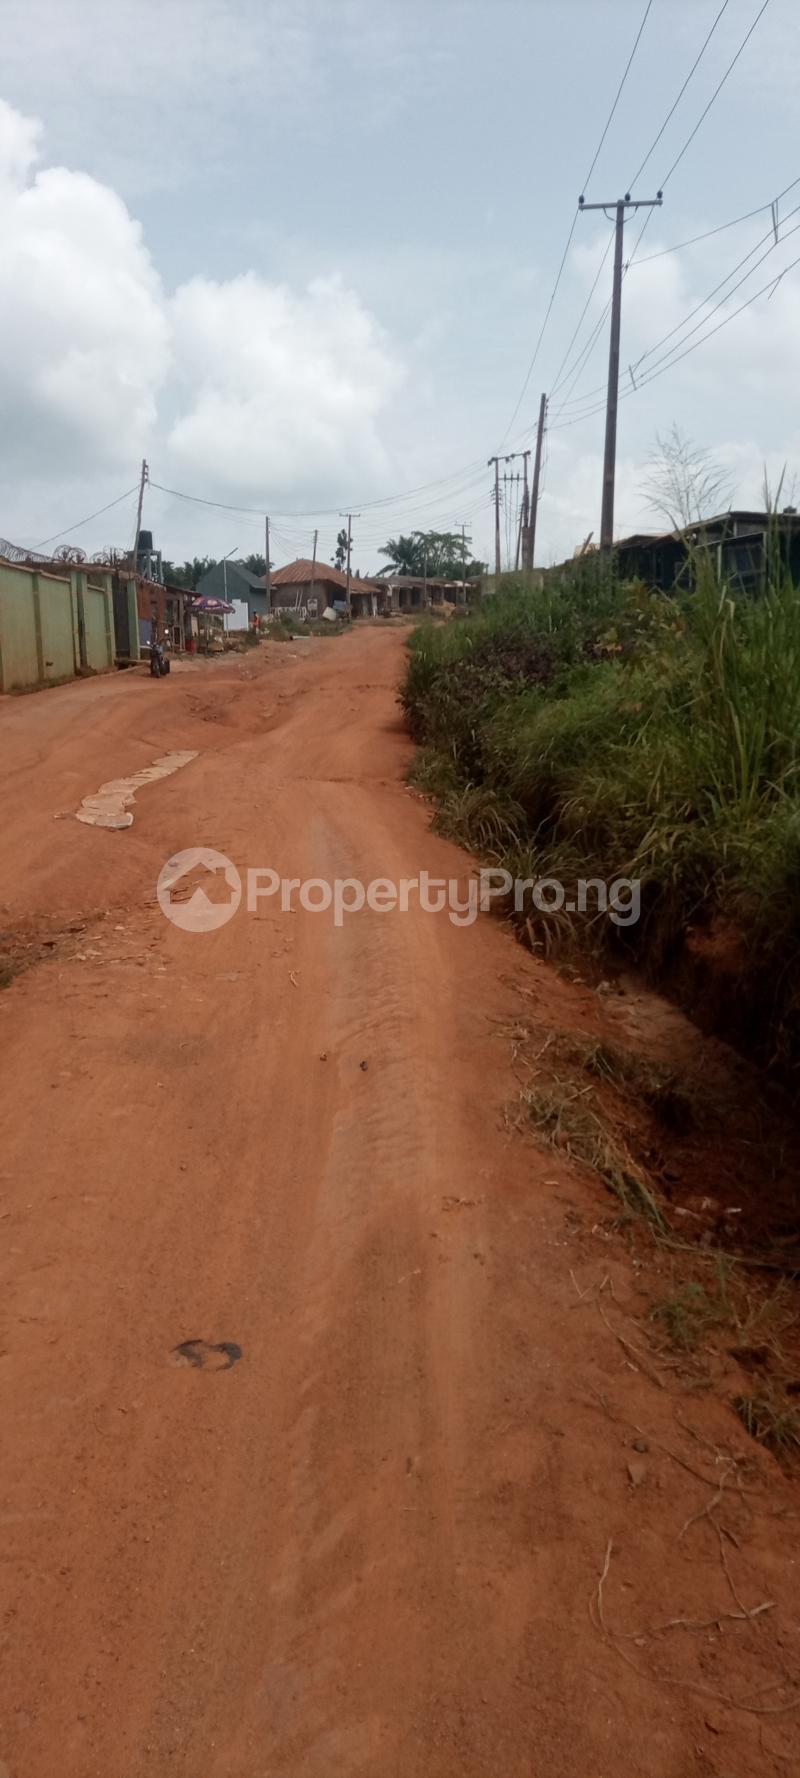 Residential Land for sale Oka, Along Stella Palace Hotel Road Ondo City Ondo West Ondo - 3